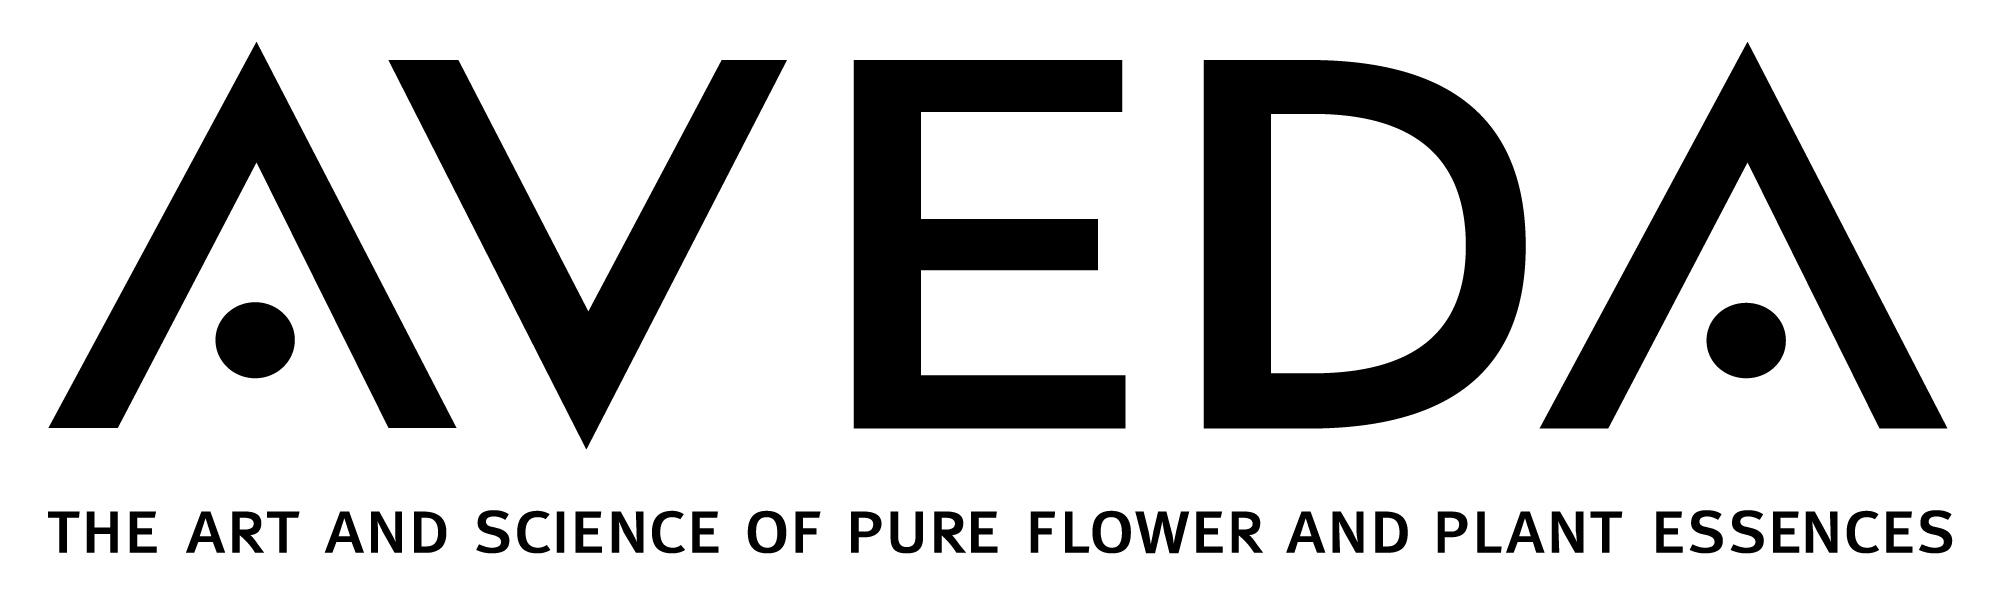 Aveda-Logo-09-one-line.jpg